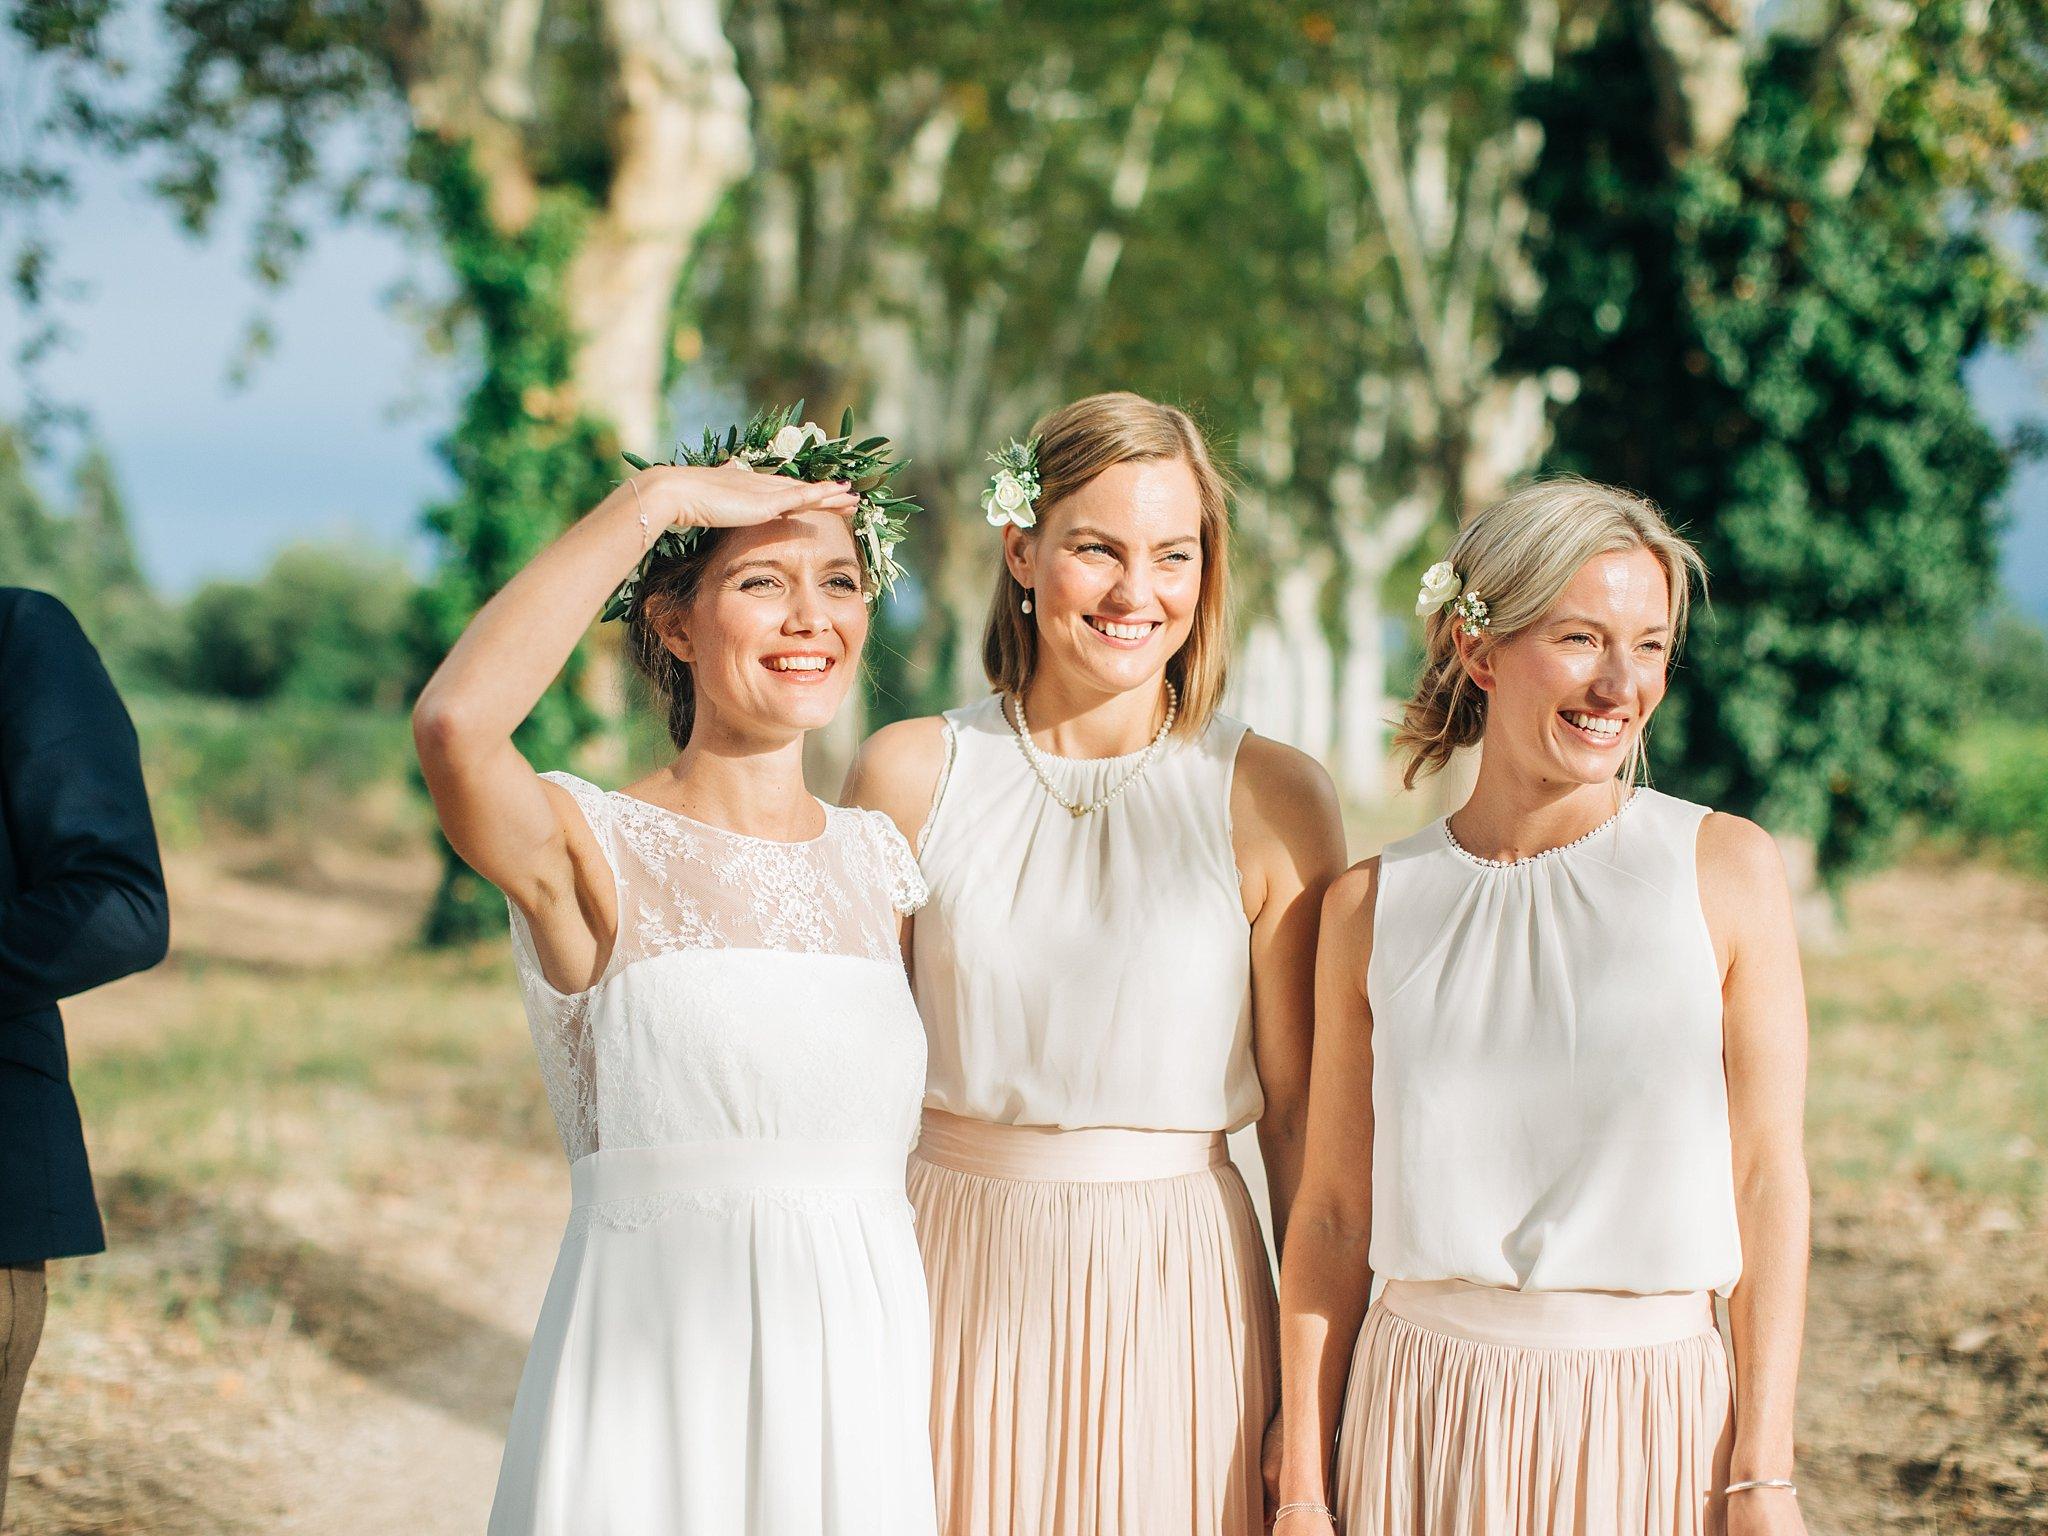 Wedding Photographer Perpignan - Château Las Collas Wedding - Hugo Hennequin087.jpg